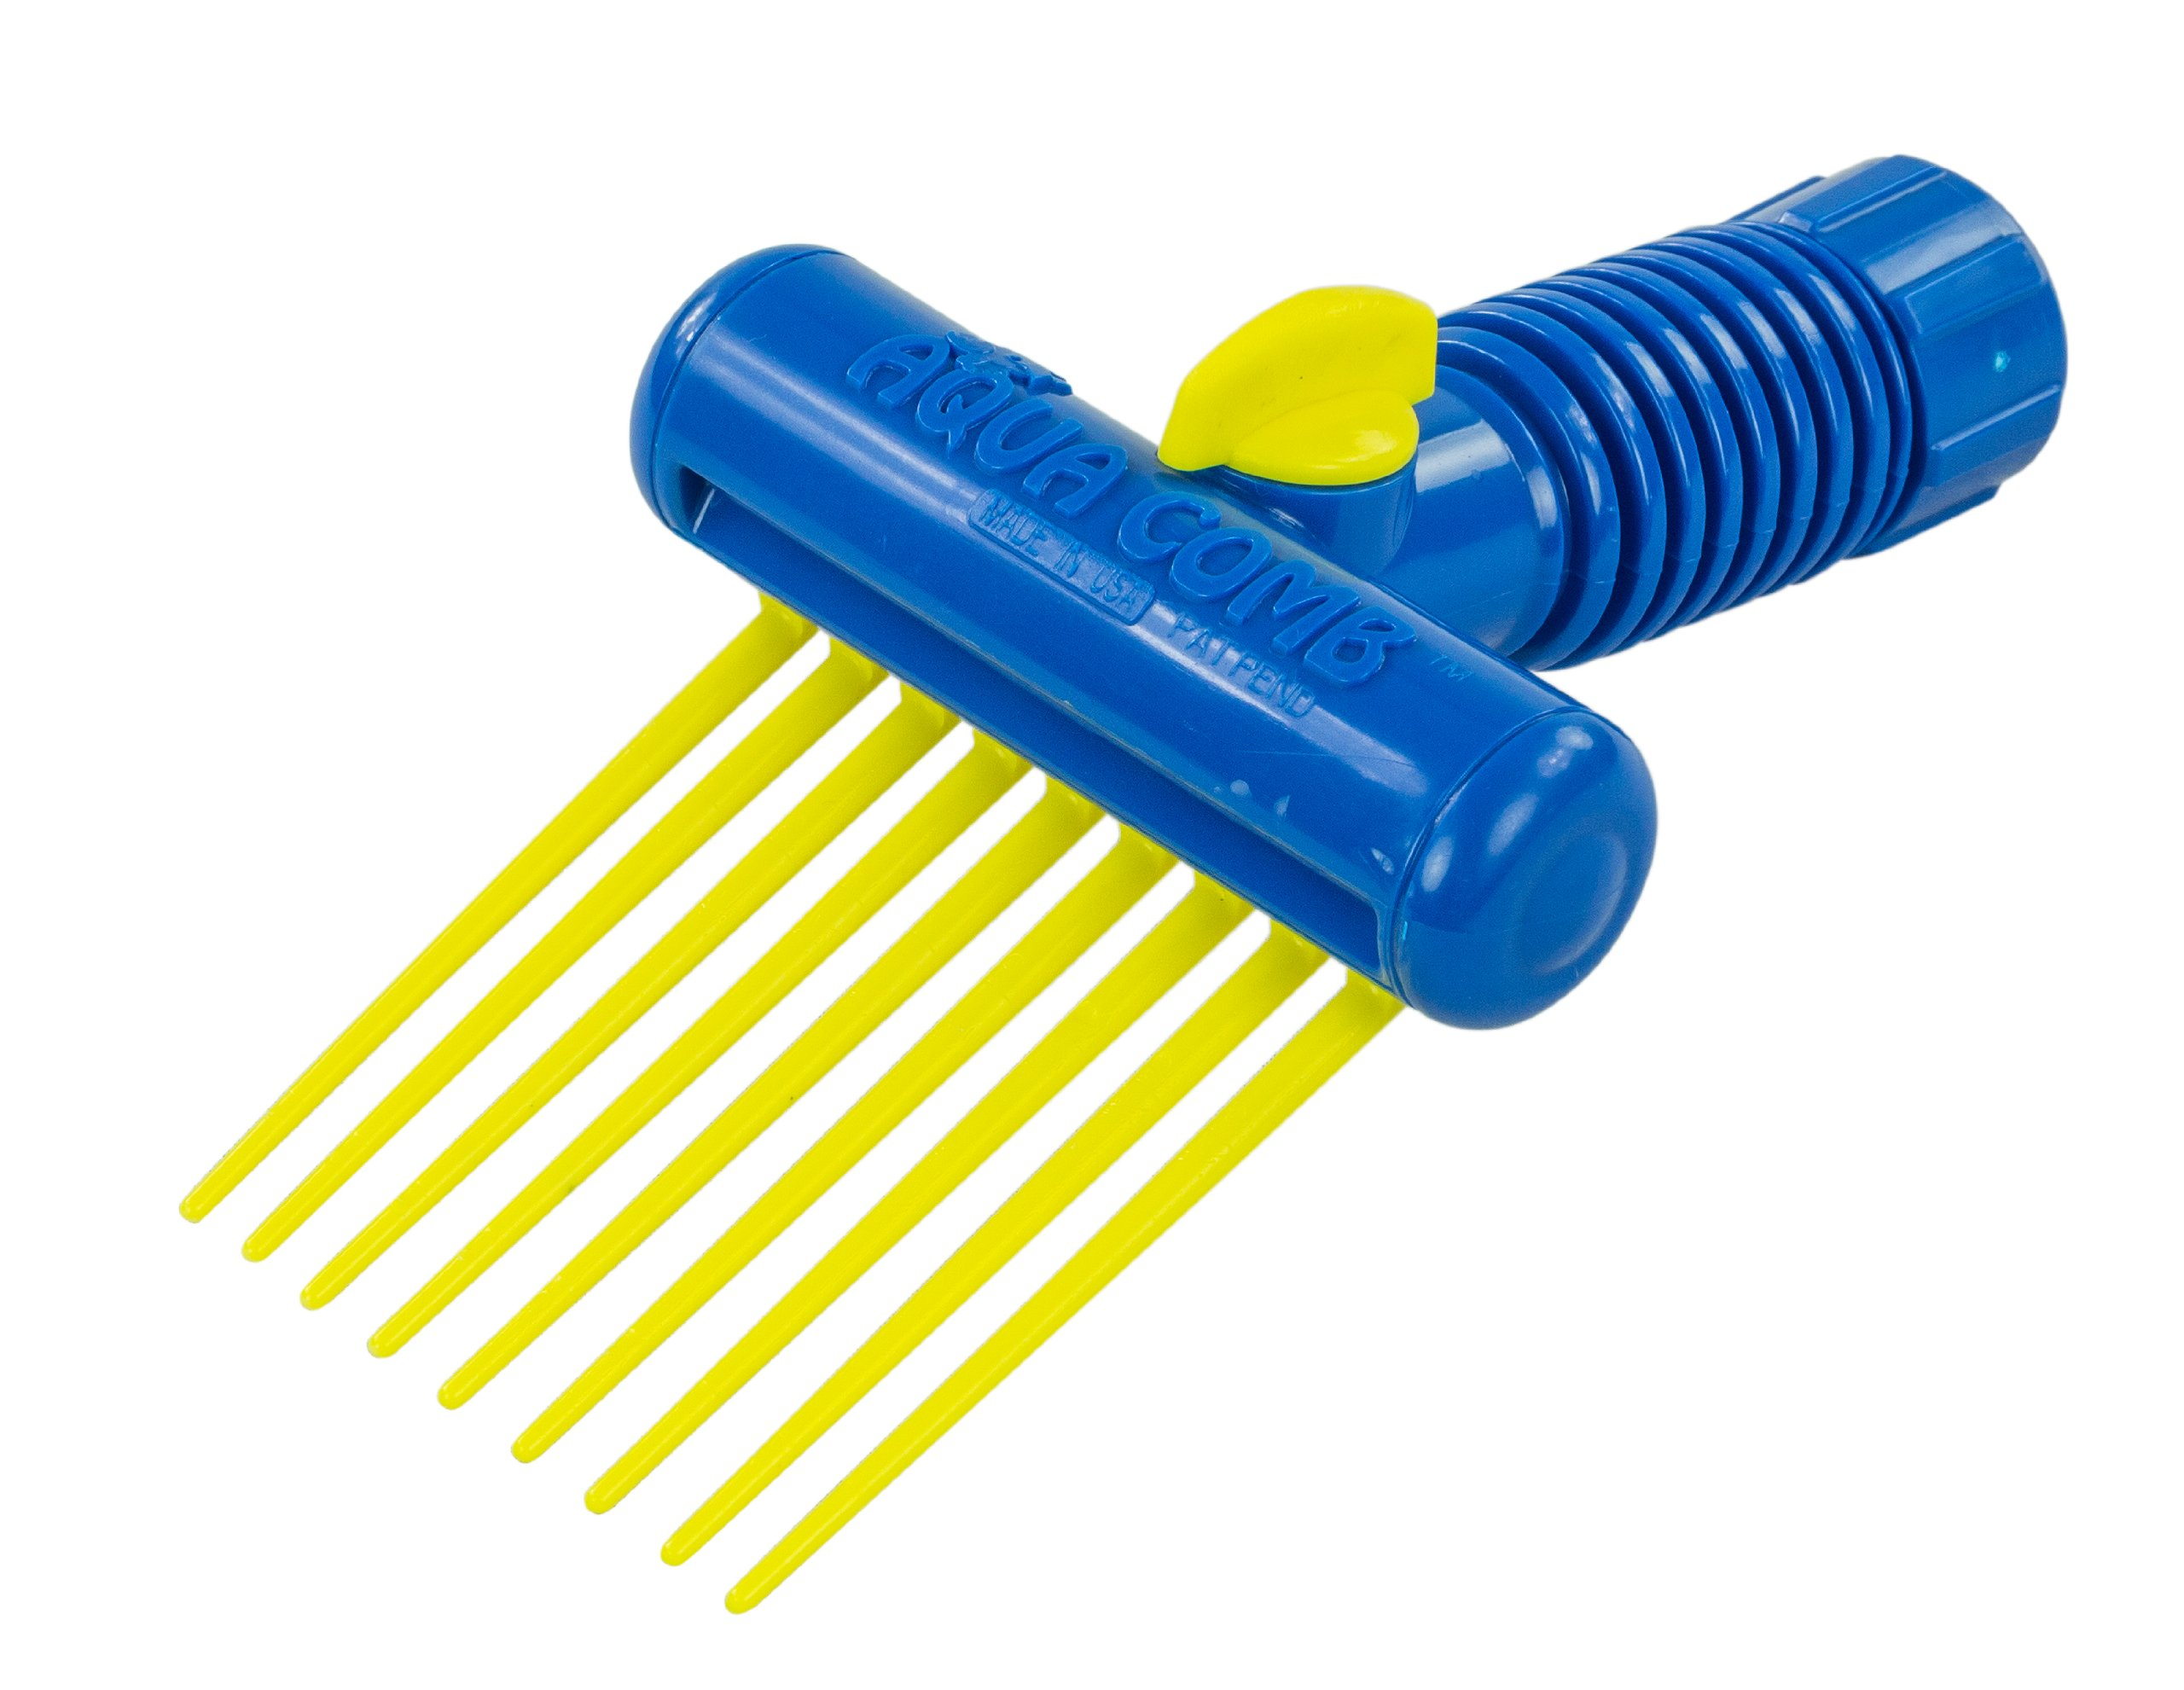 Aqua Comb Pool Cartridge Cleaner Tool - Filter Fin Depth 1-1/4'' to 2-1/2